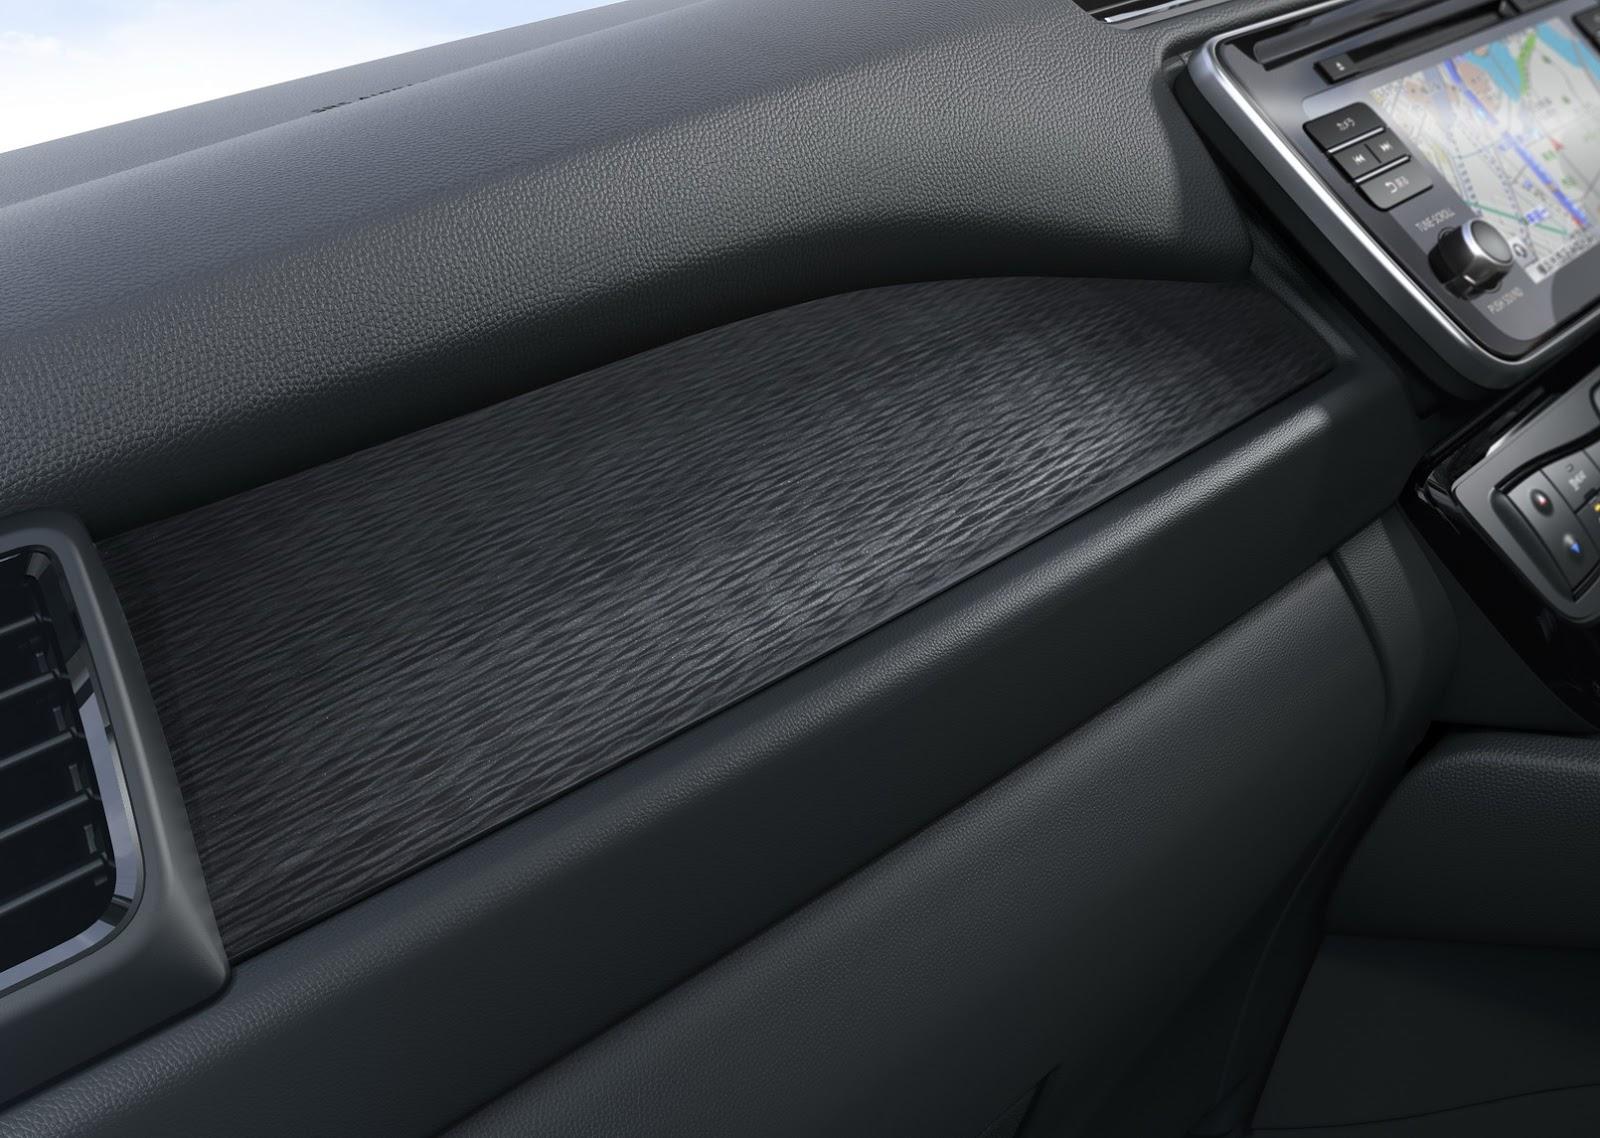 Nissan Leaf 2018 EU (29)